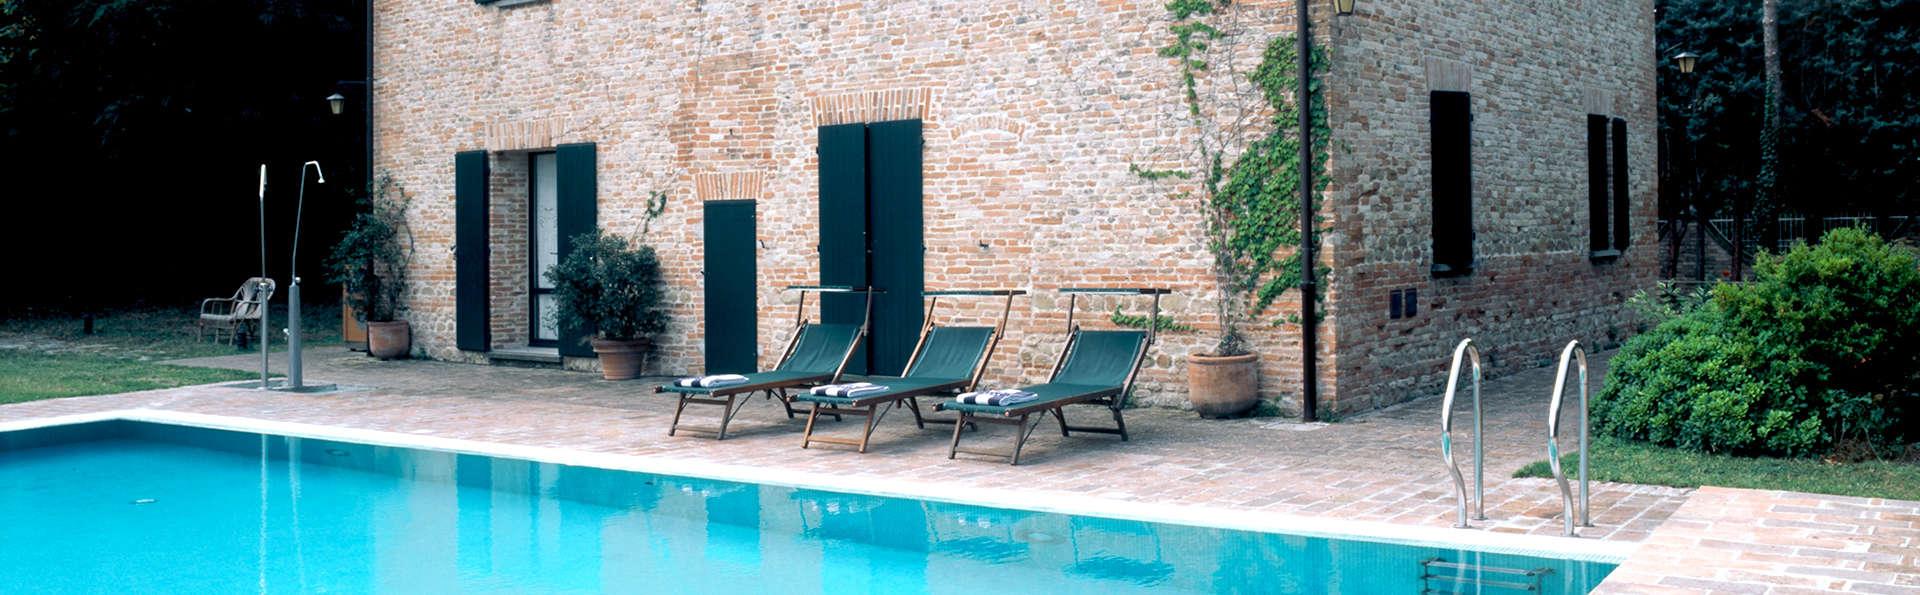 Castello di Montegridolfo Spa Resort - Edit_Pool.jpg